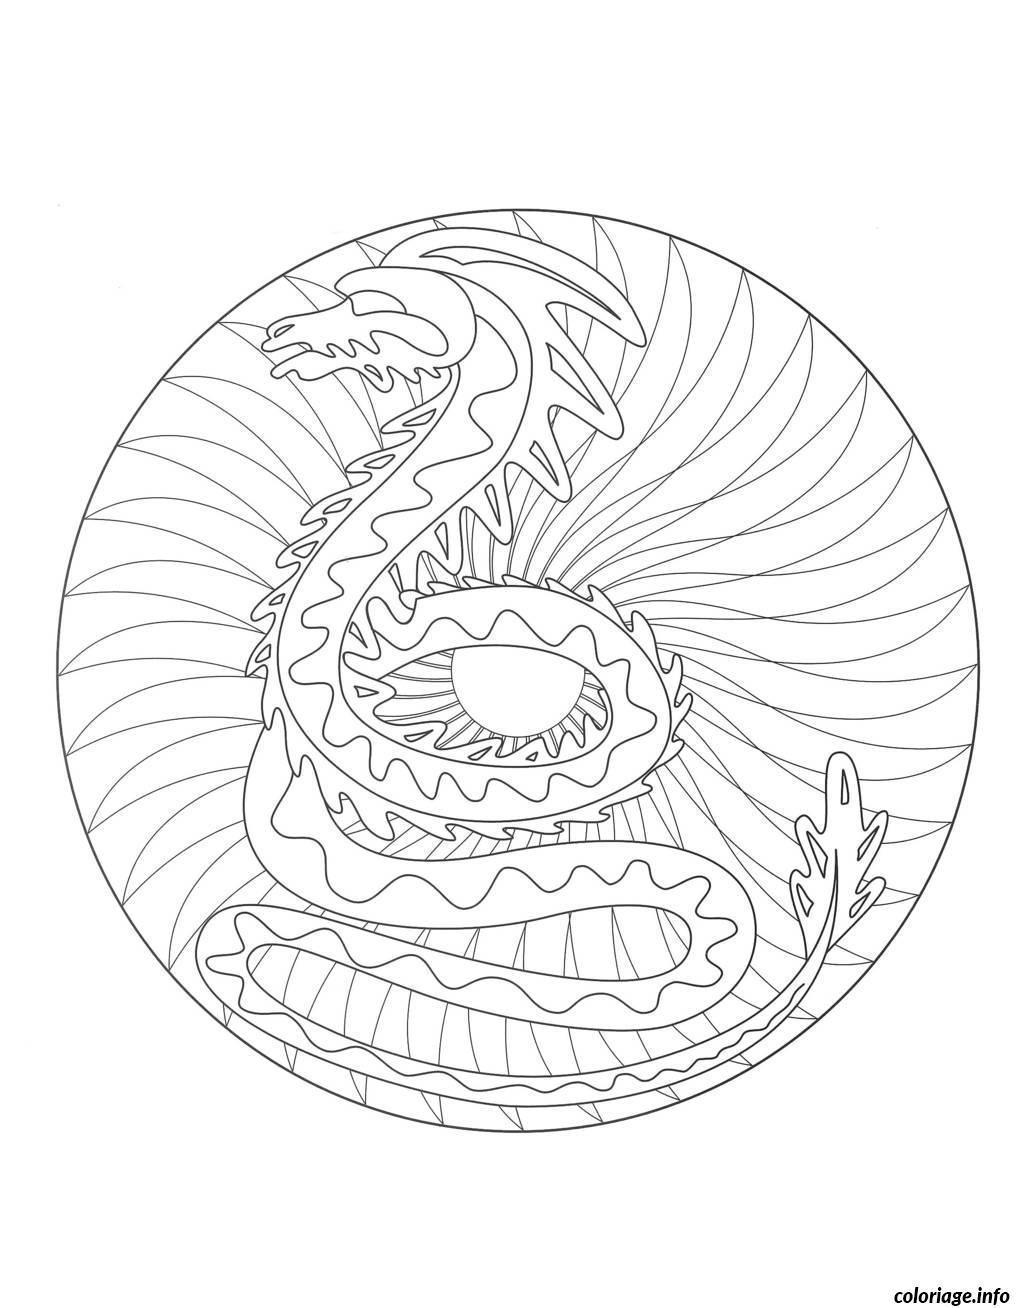 Coloriage Coloring Mandala Dragon 2 Dessin